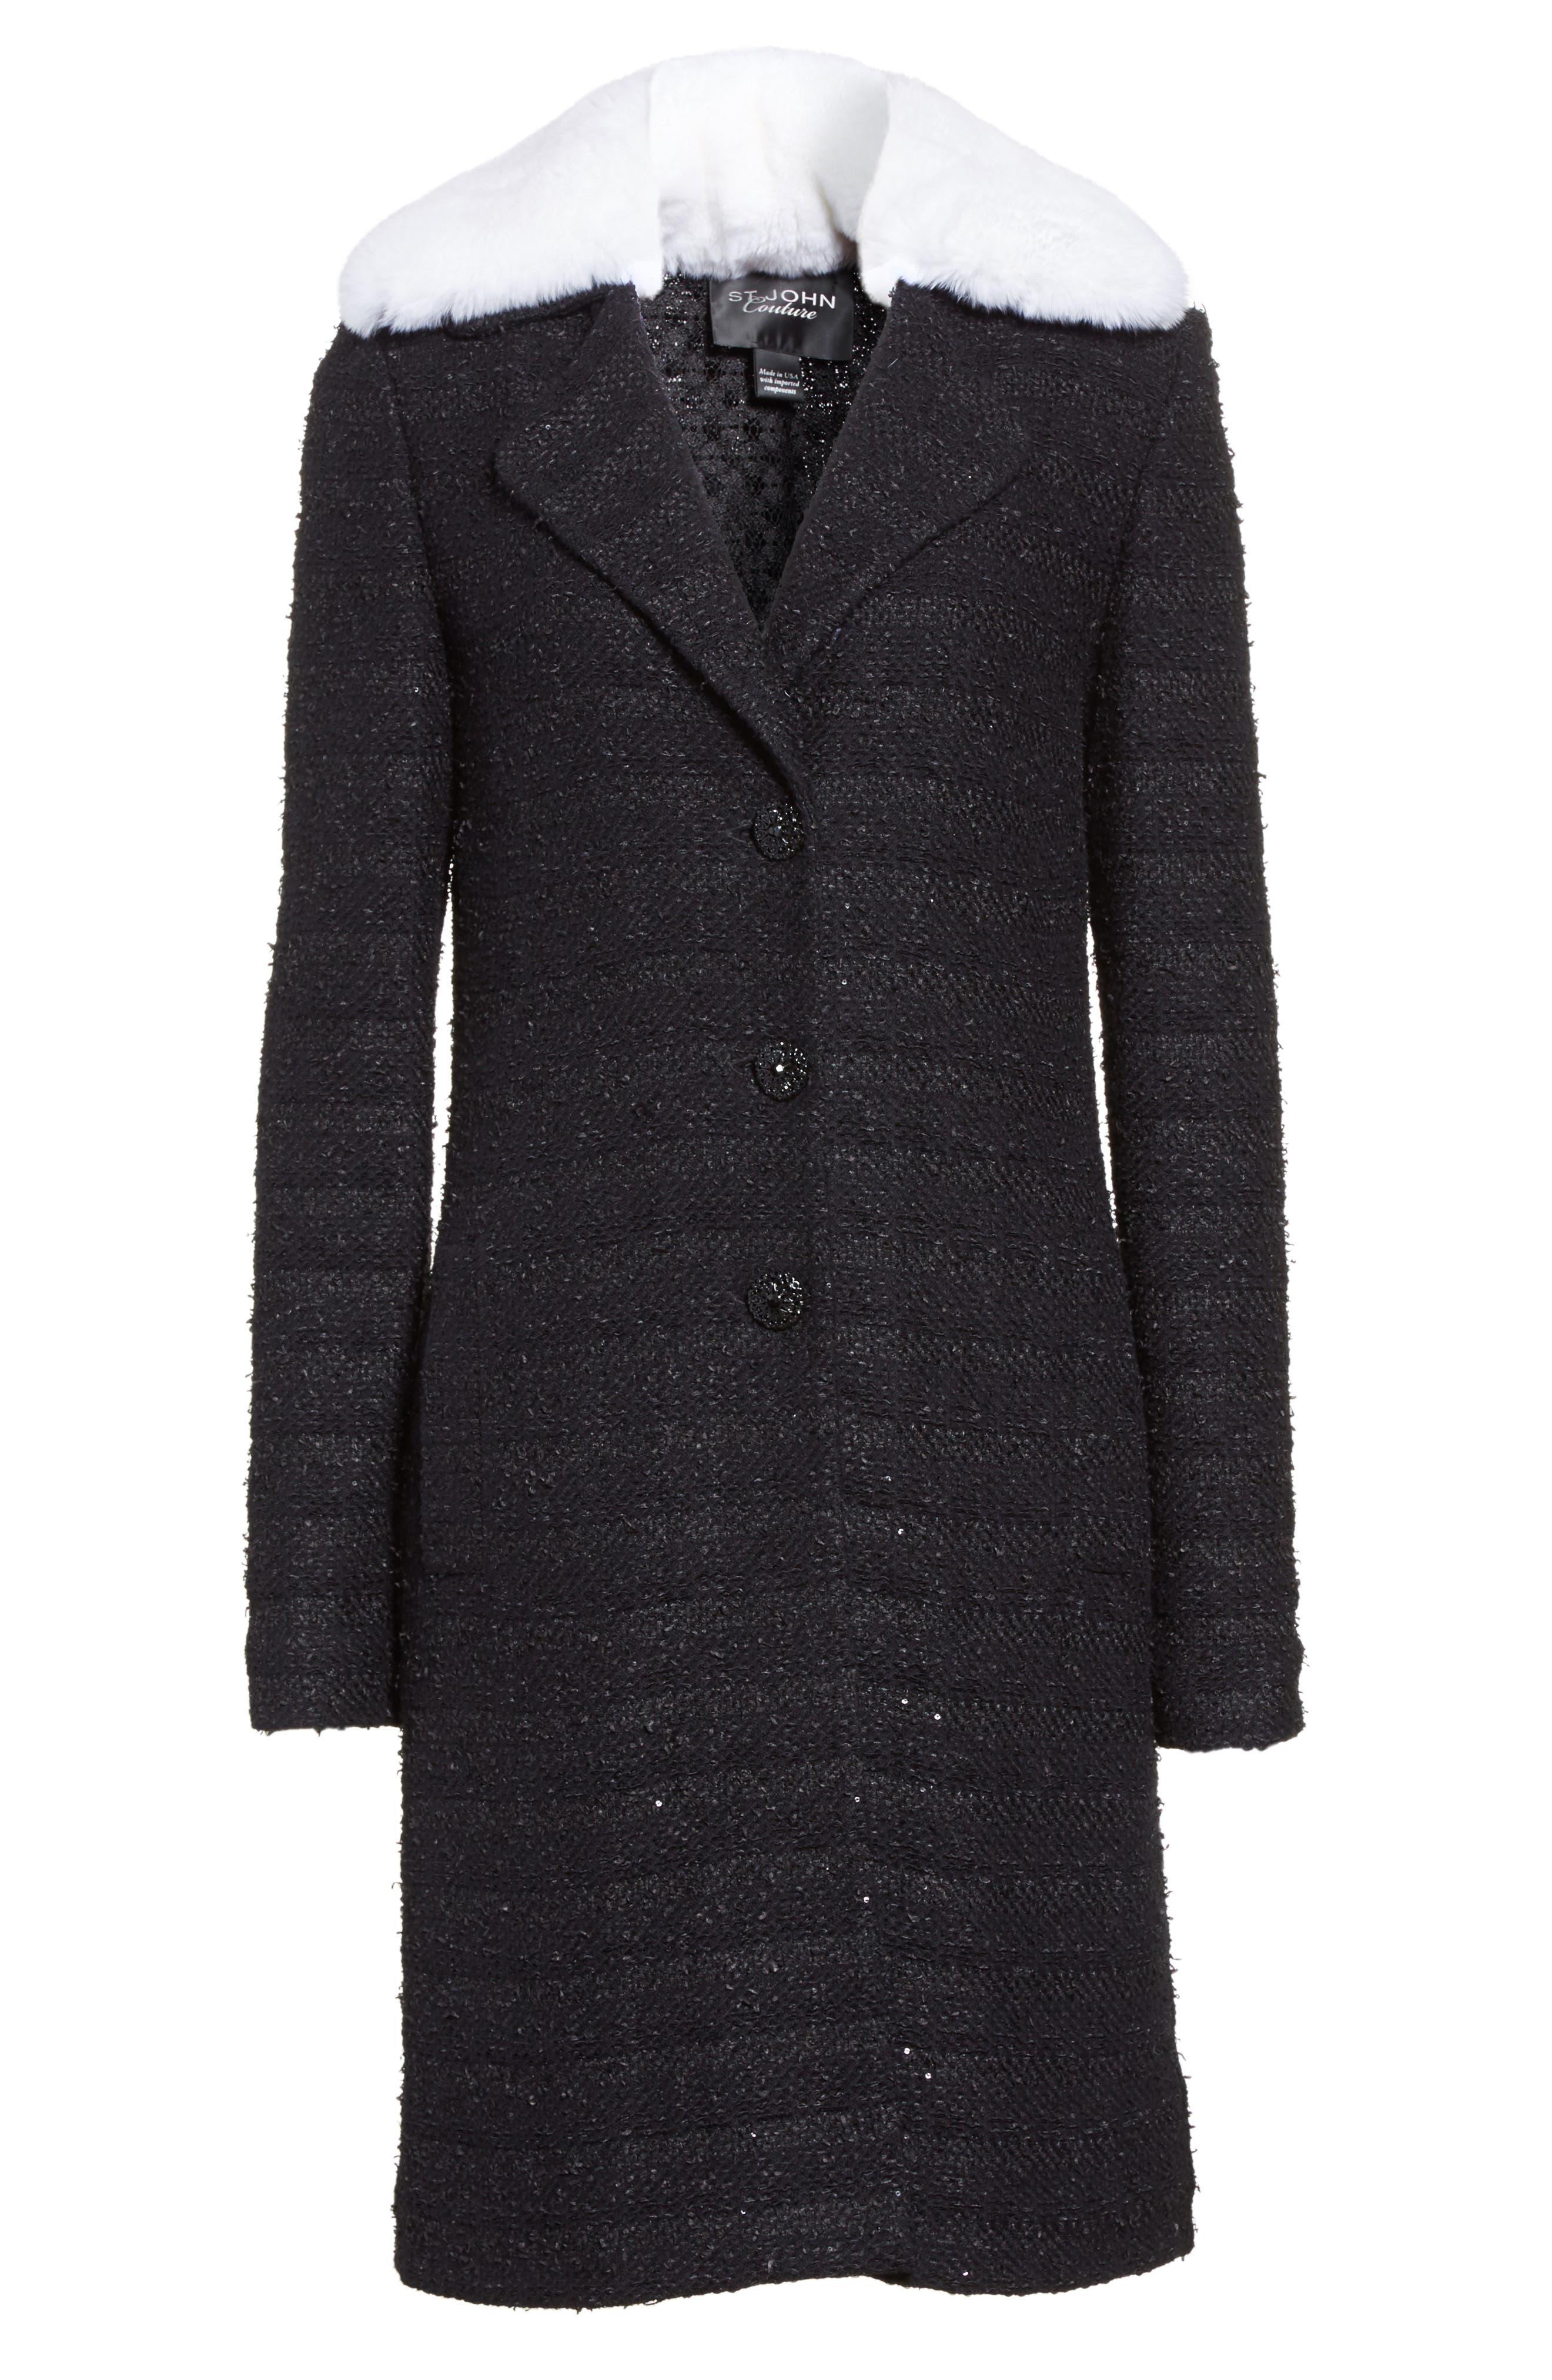 Sequin Knit Topper with Detachable Genuine Rabbit Fur Collar,                             Alternate thumbnail 6, color,                             001